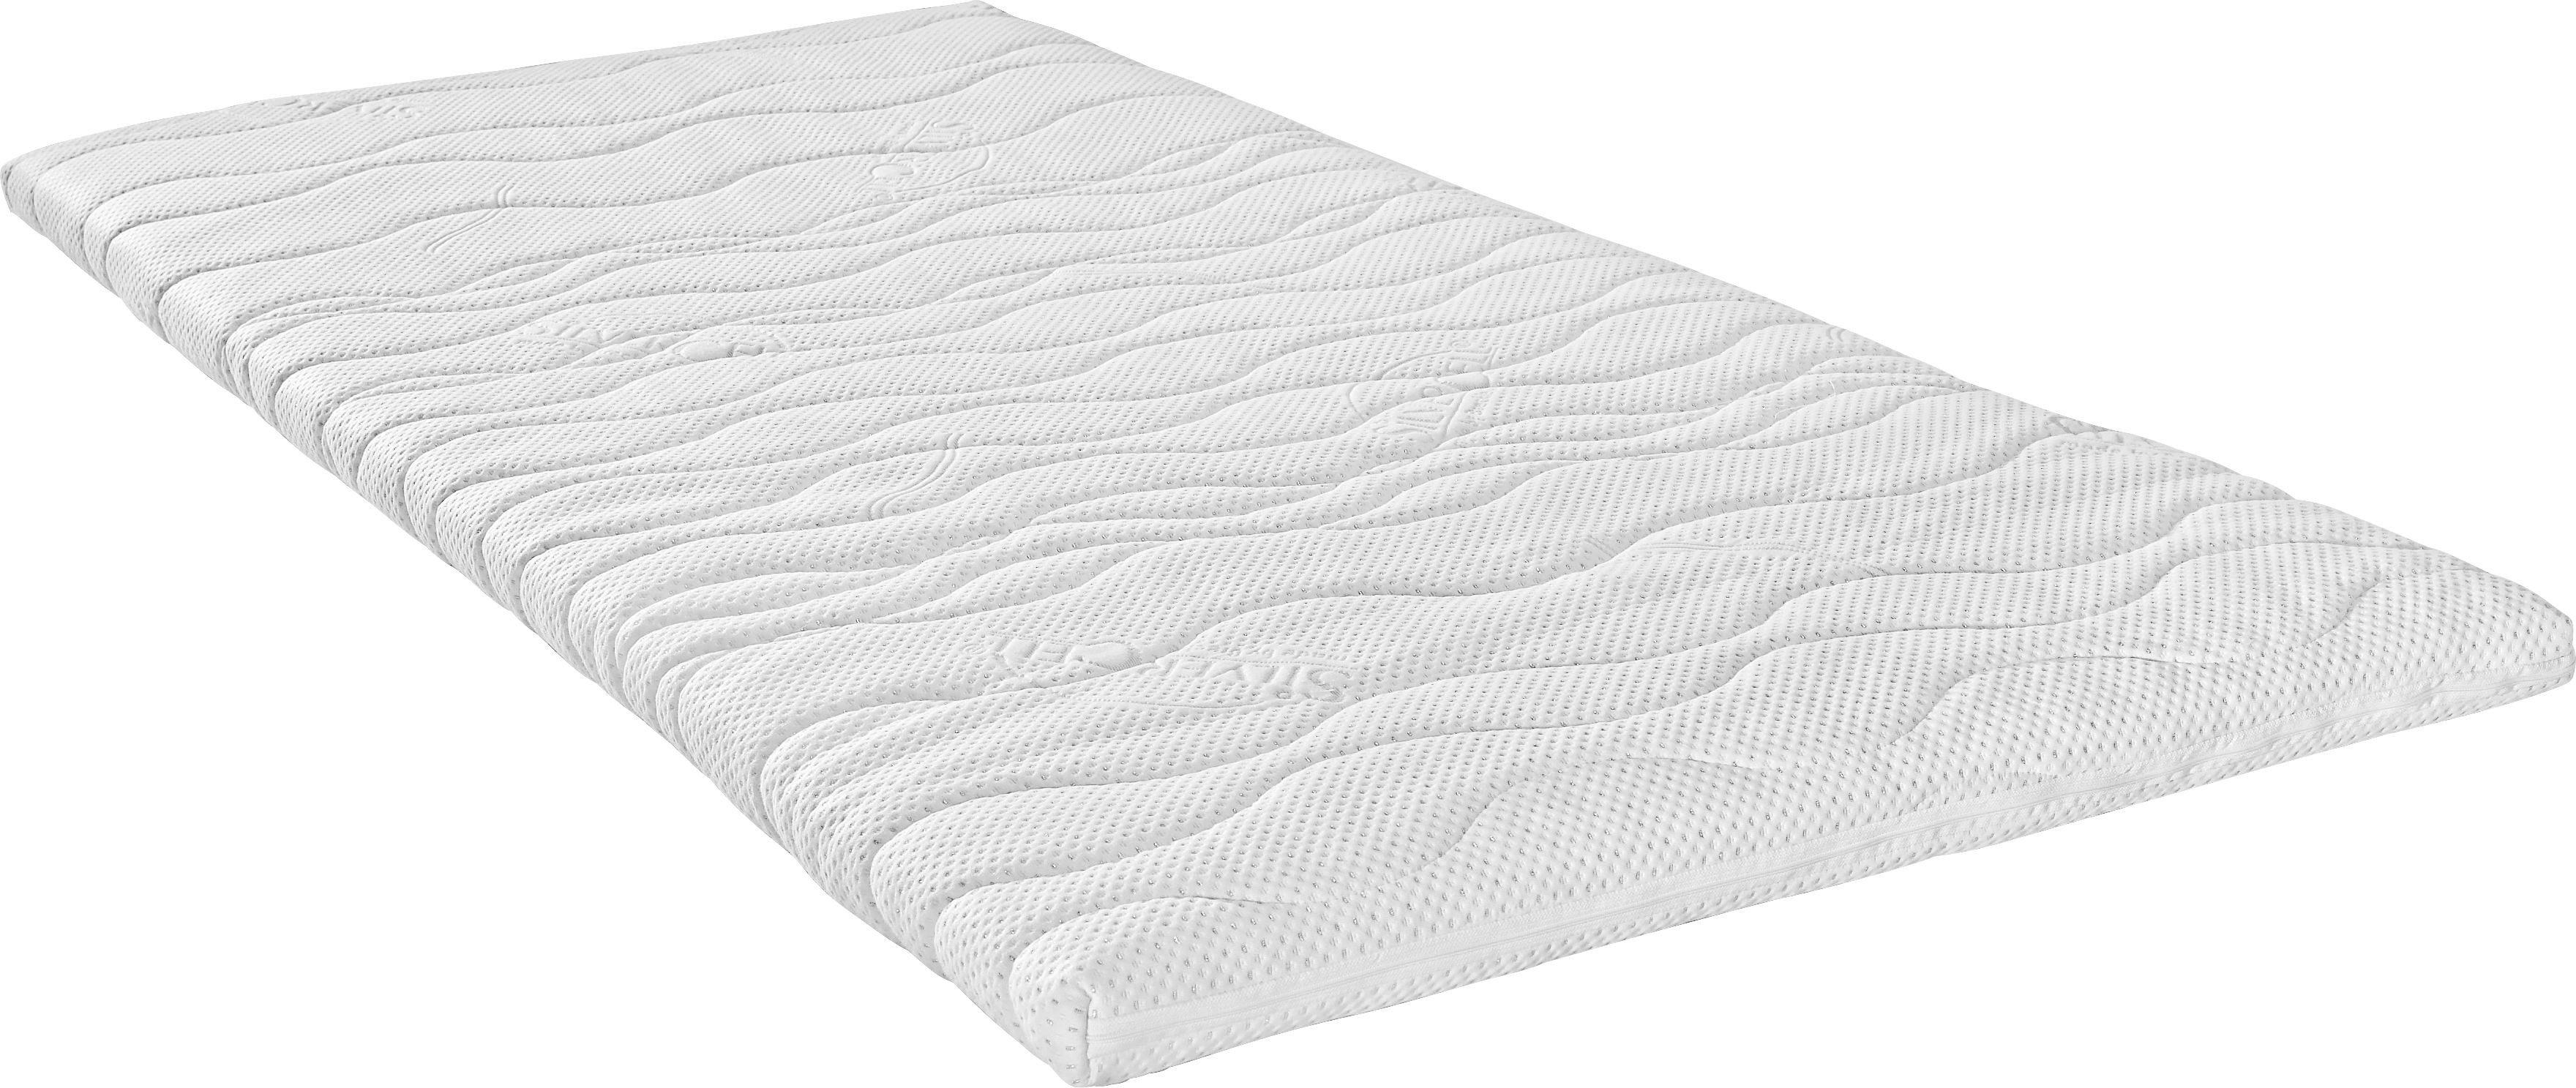 BÄDDMADRASS - vit, Basics, textil (100/200cm) - Low Price